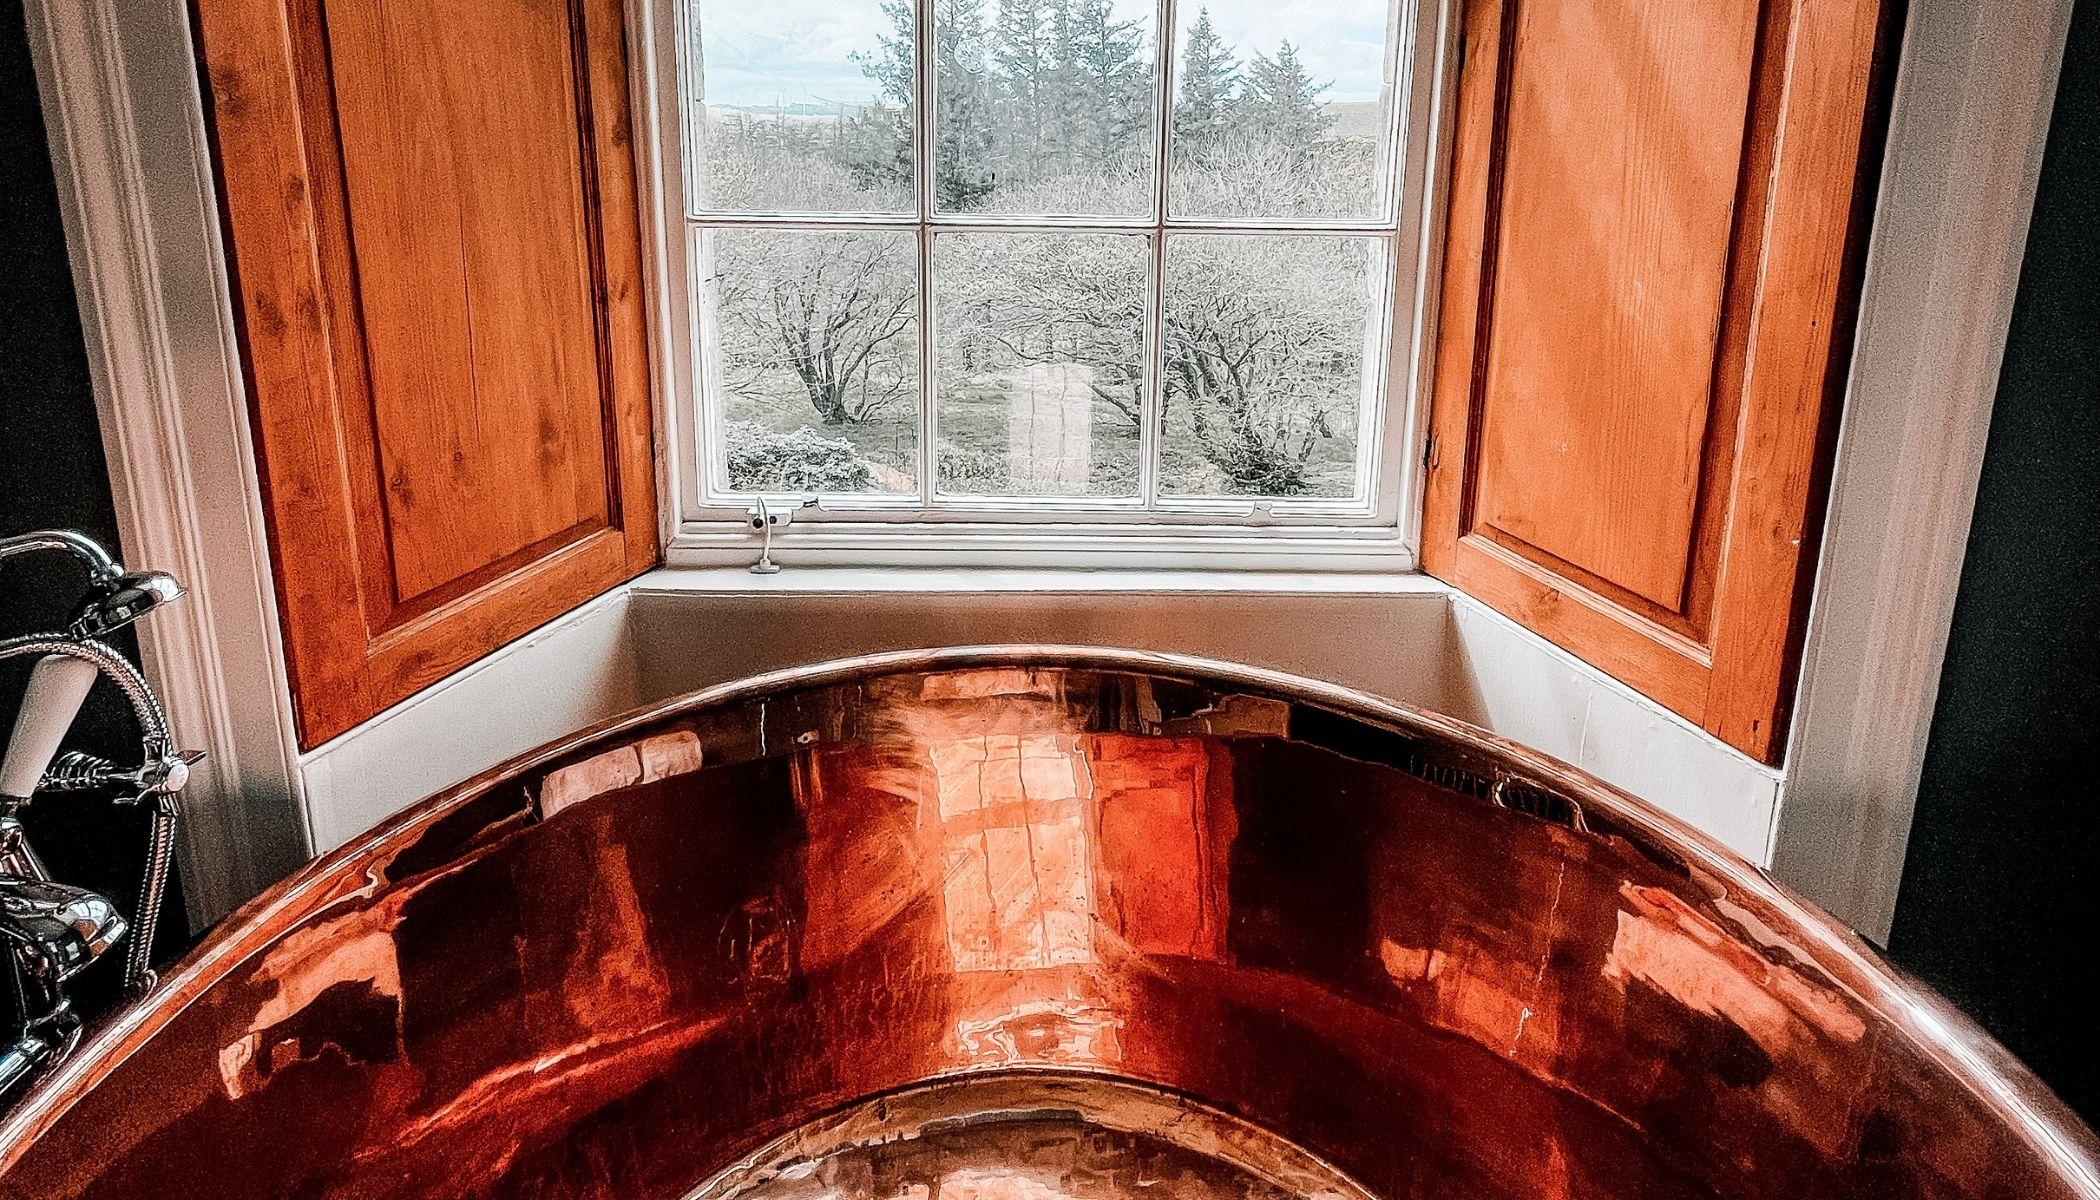 Stunning Copper Tub